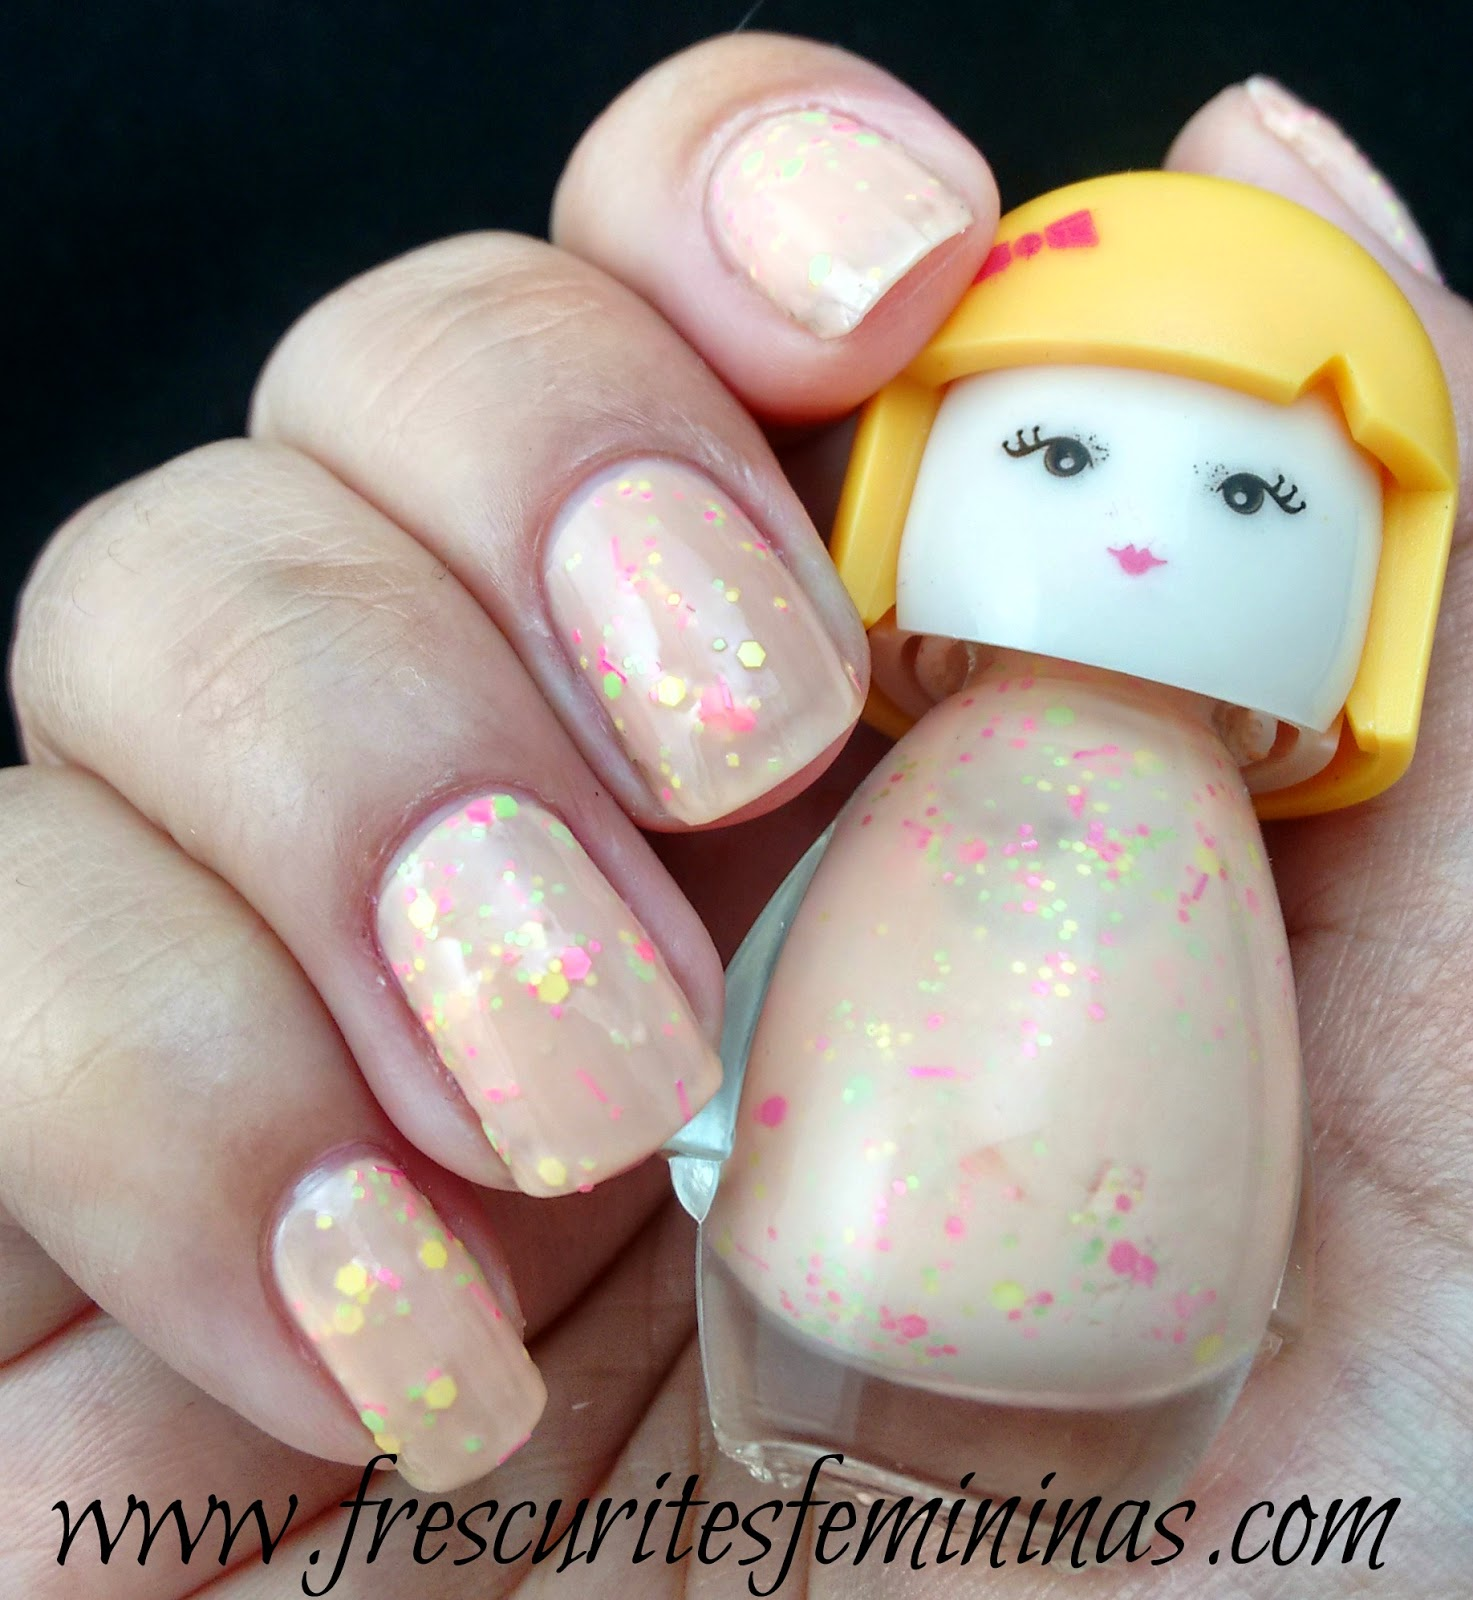 Frescurites Femininas, Cute Doll, 44